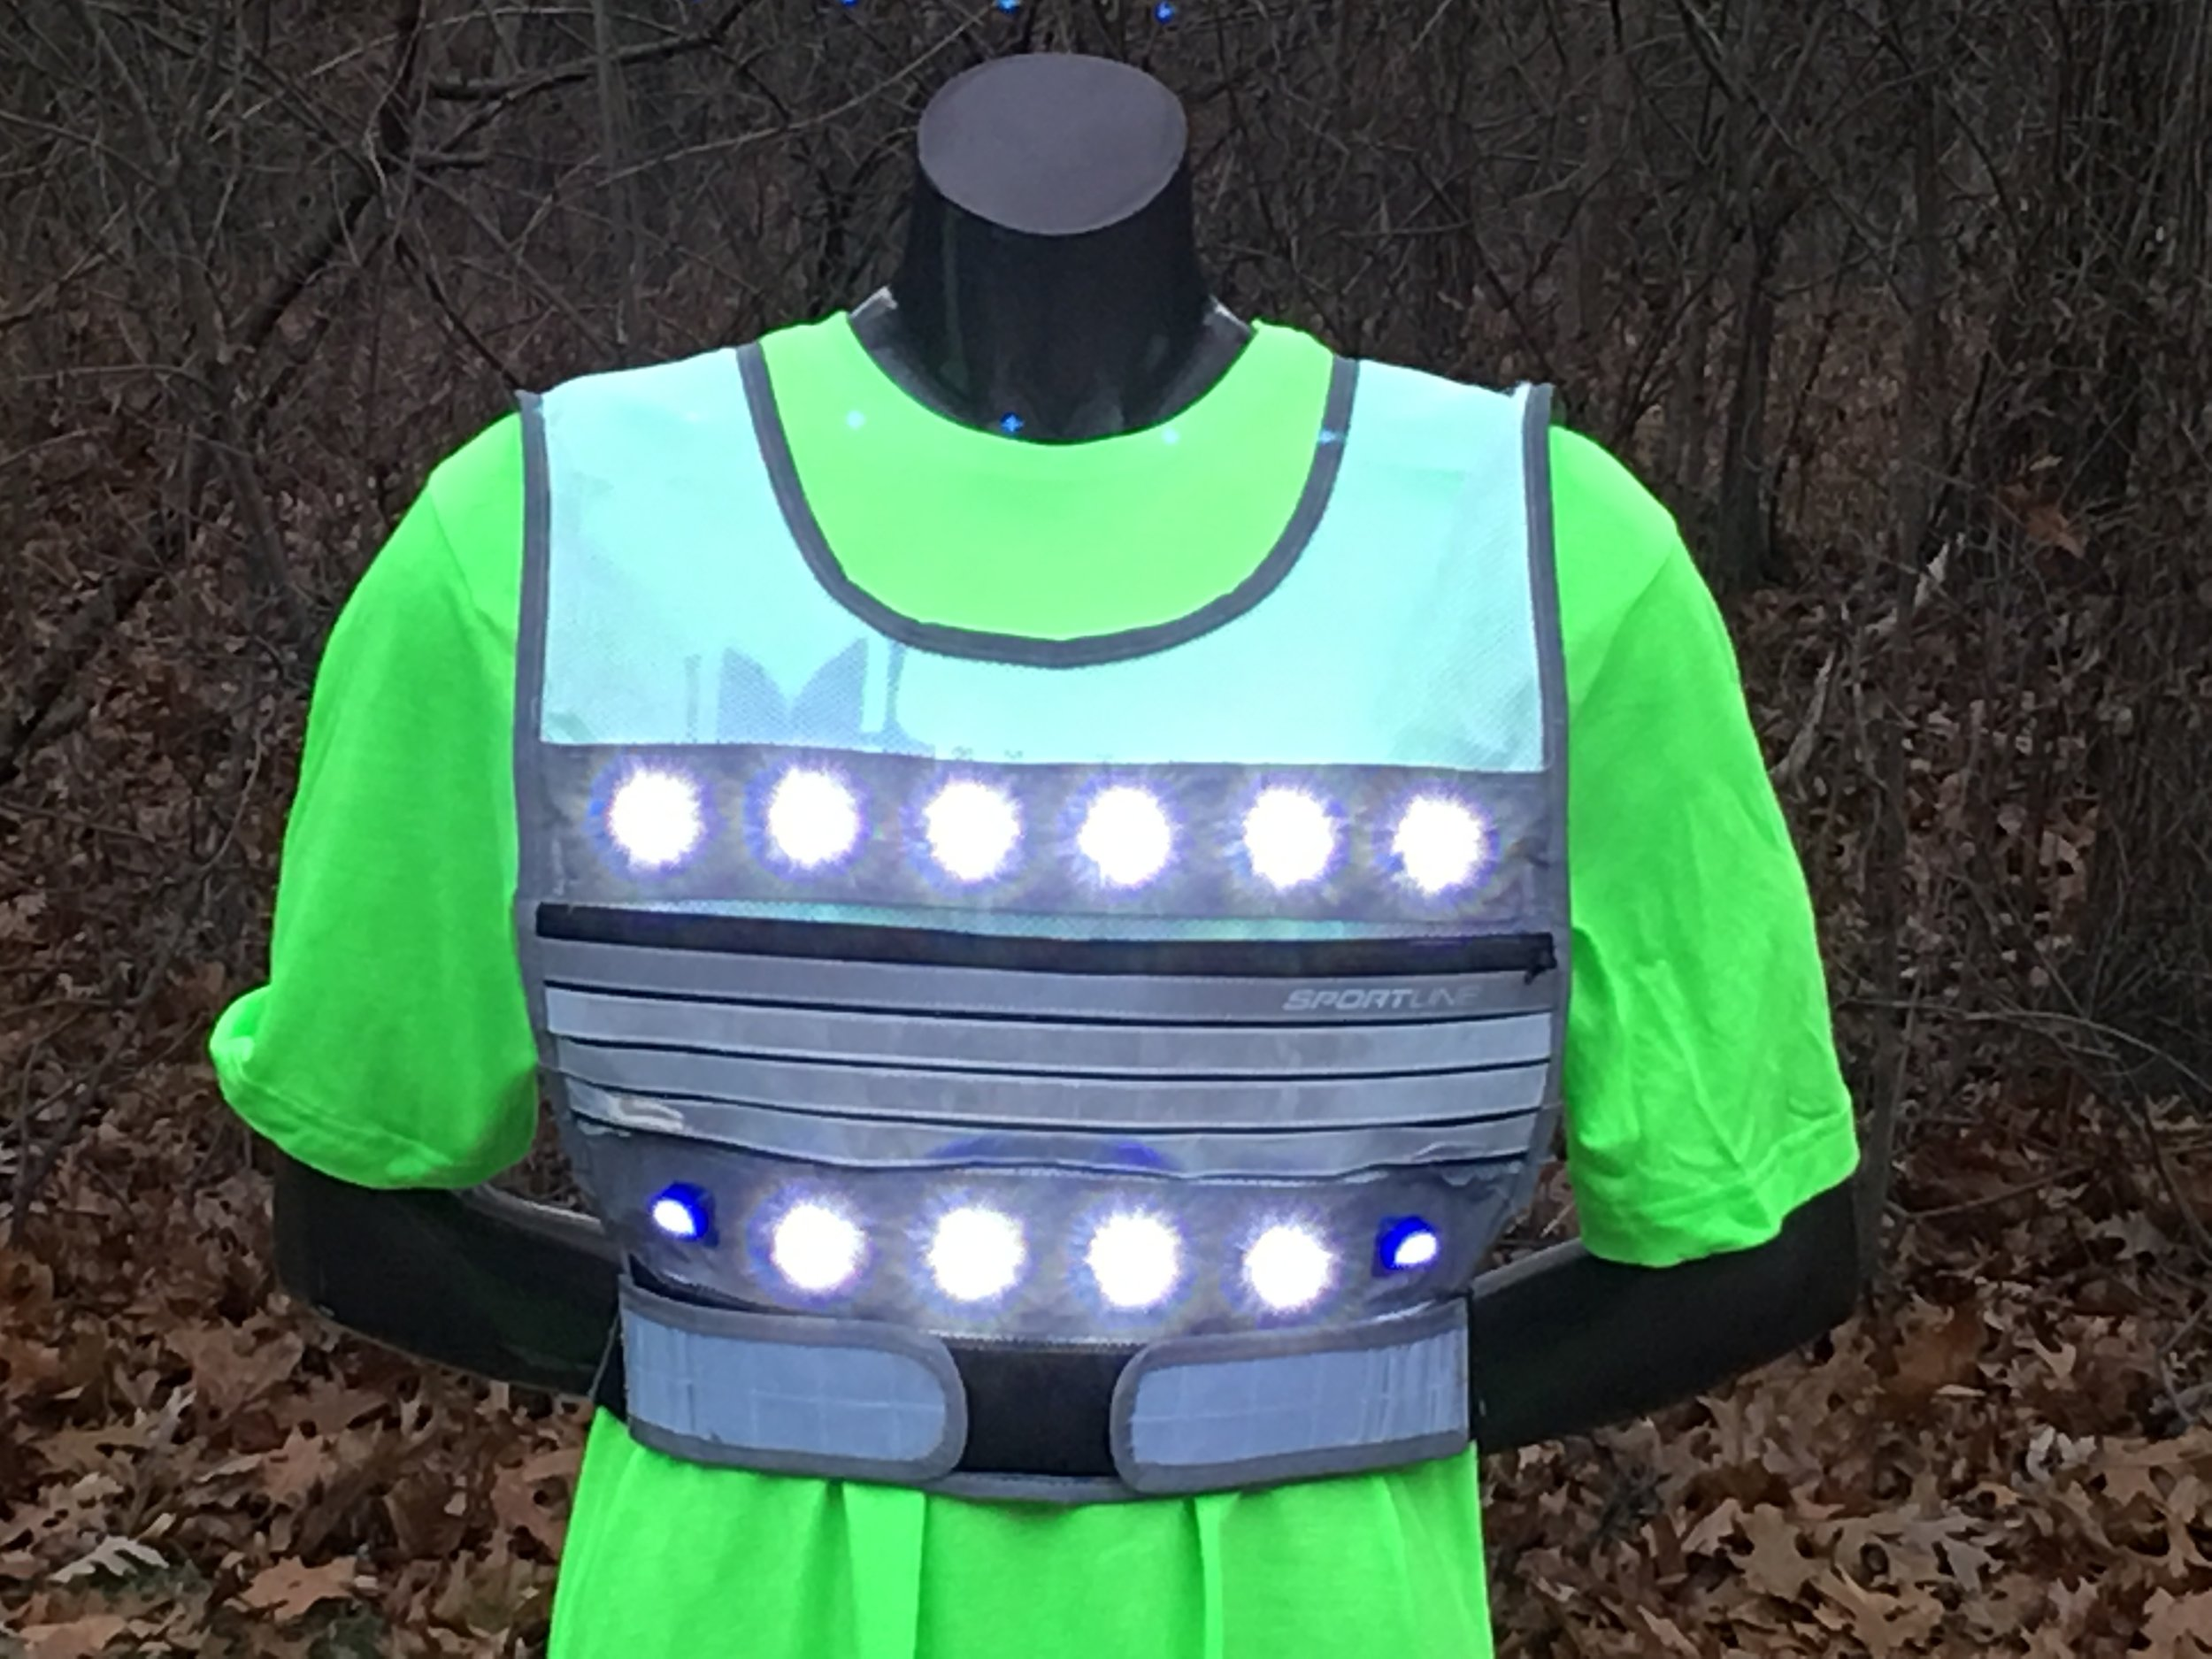 LEDLightvest-small-front-safety-vest-experts----Grand Rapids-MI.JPG